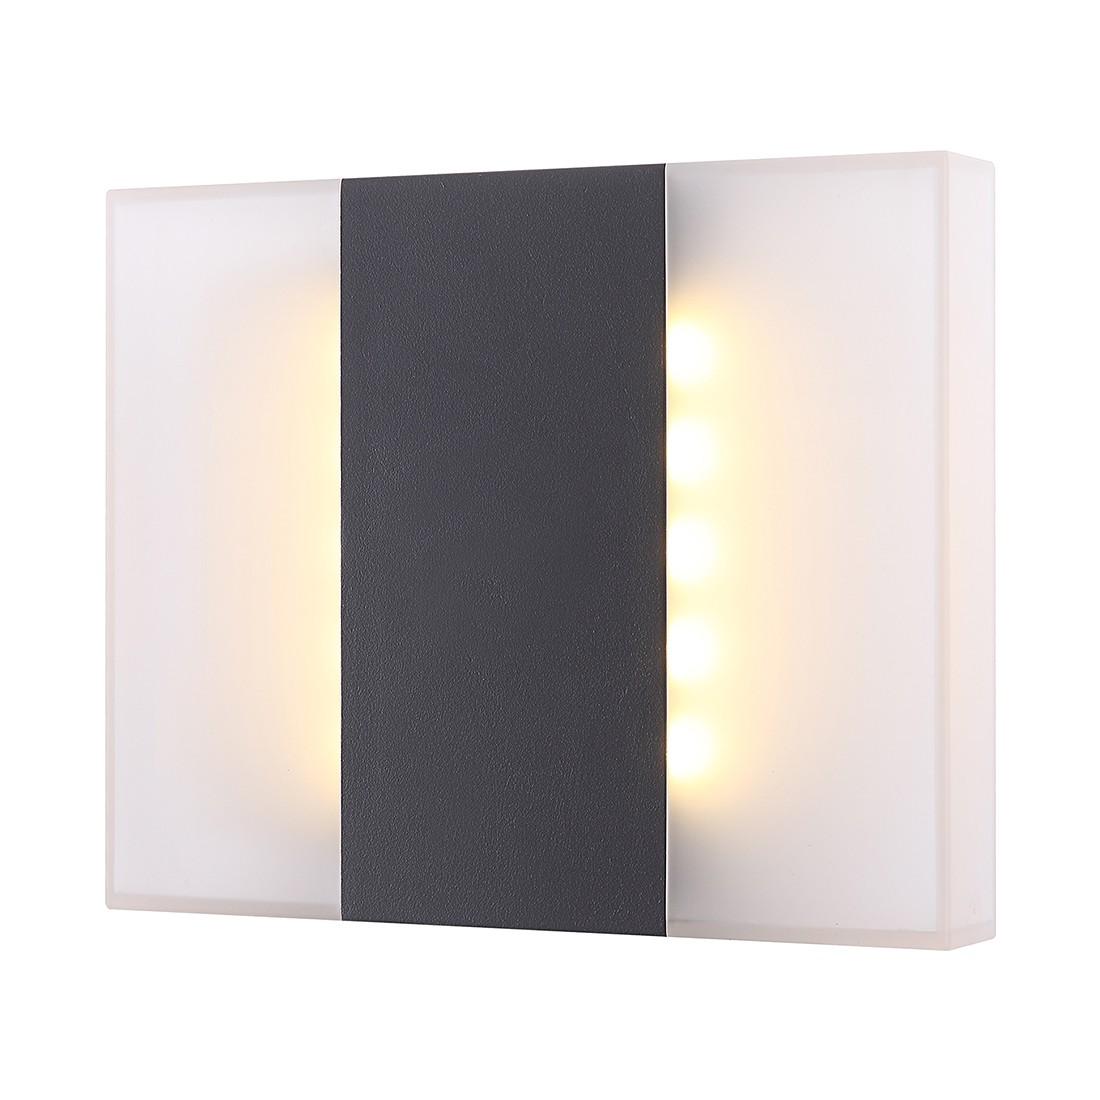 LED-Außenleuchte Moonlight II by Globo ● Aluminium/Kunststoff ● Schwarz- Globo Lighting A+